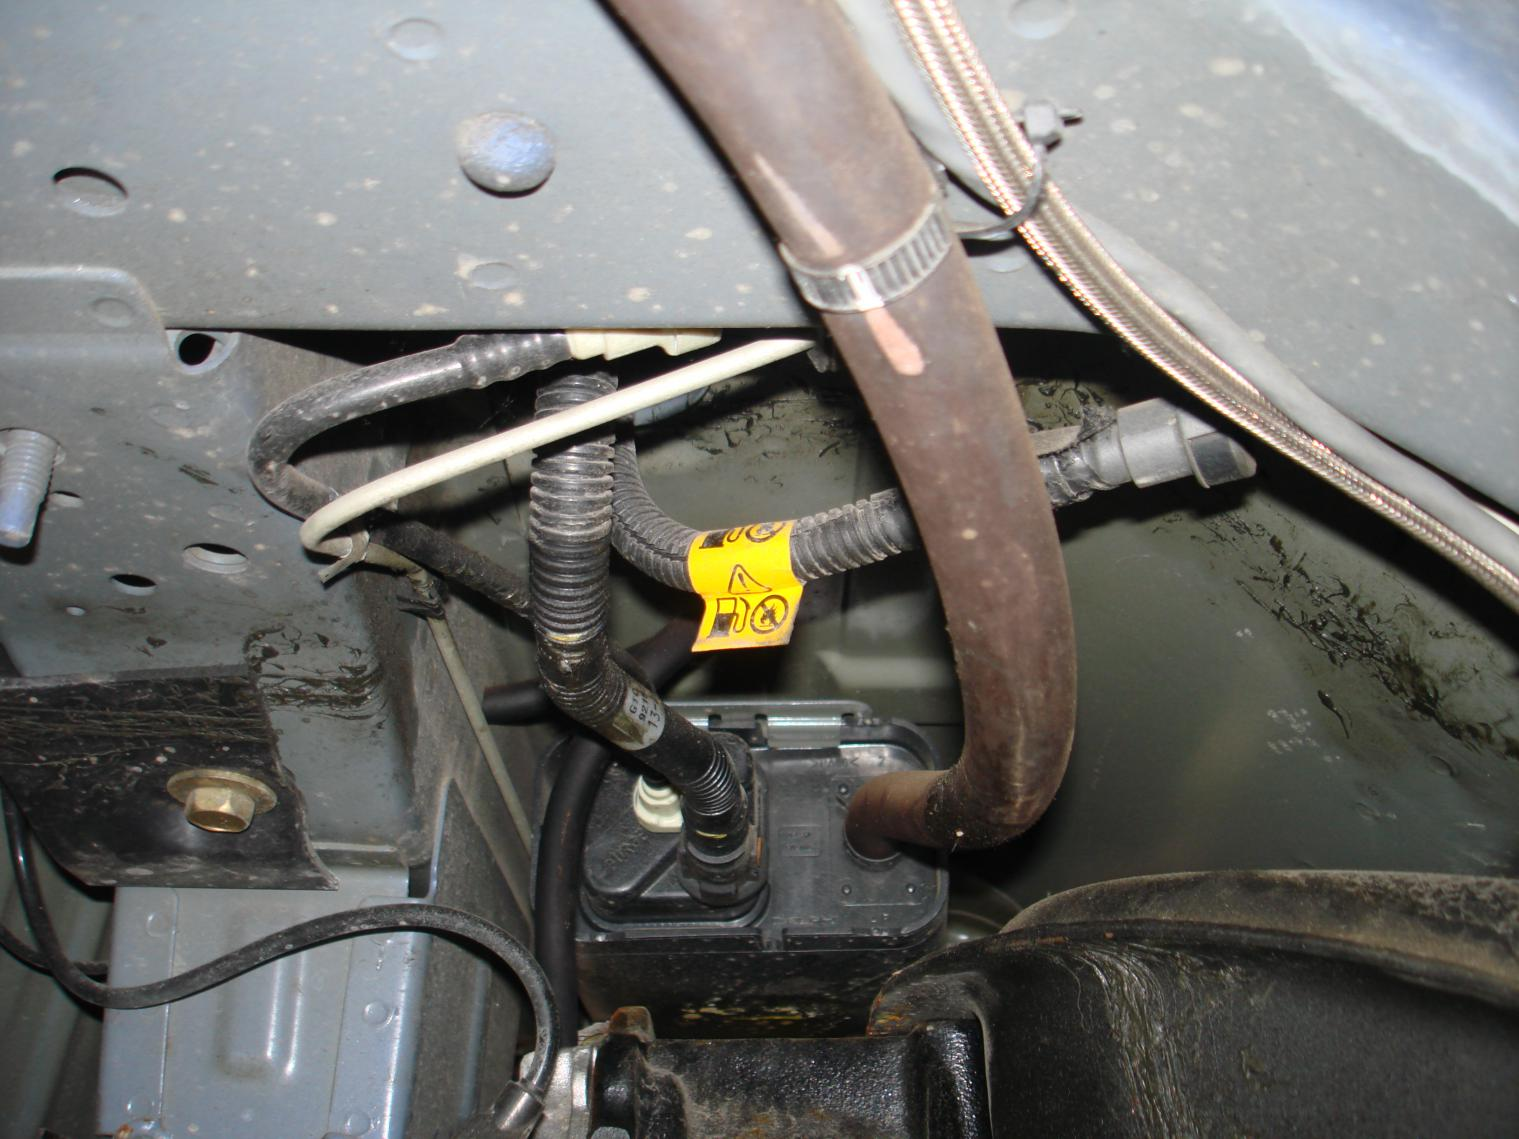 2000 Chevy Blazer Evap System Diagram